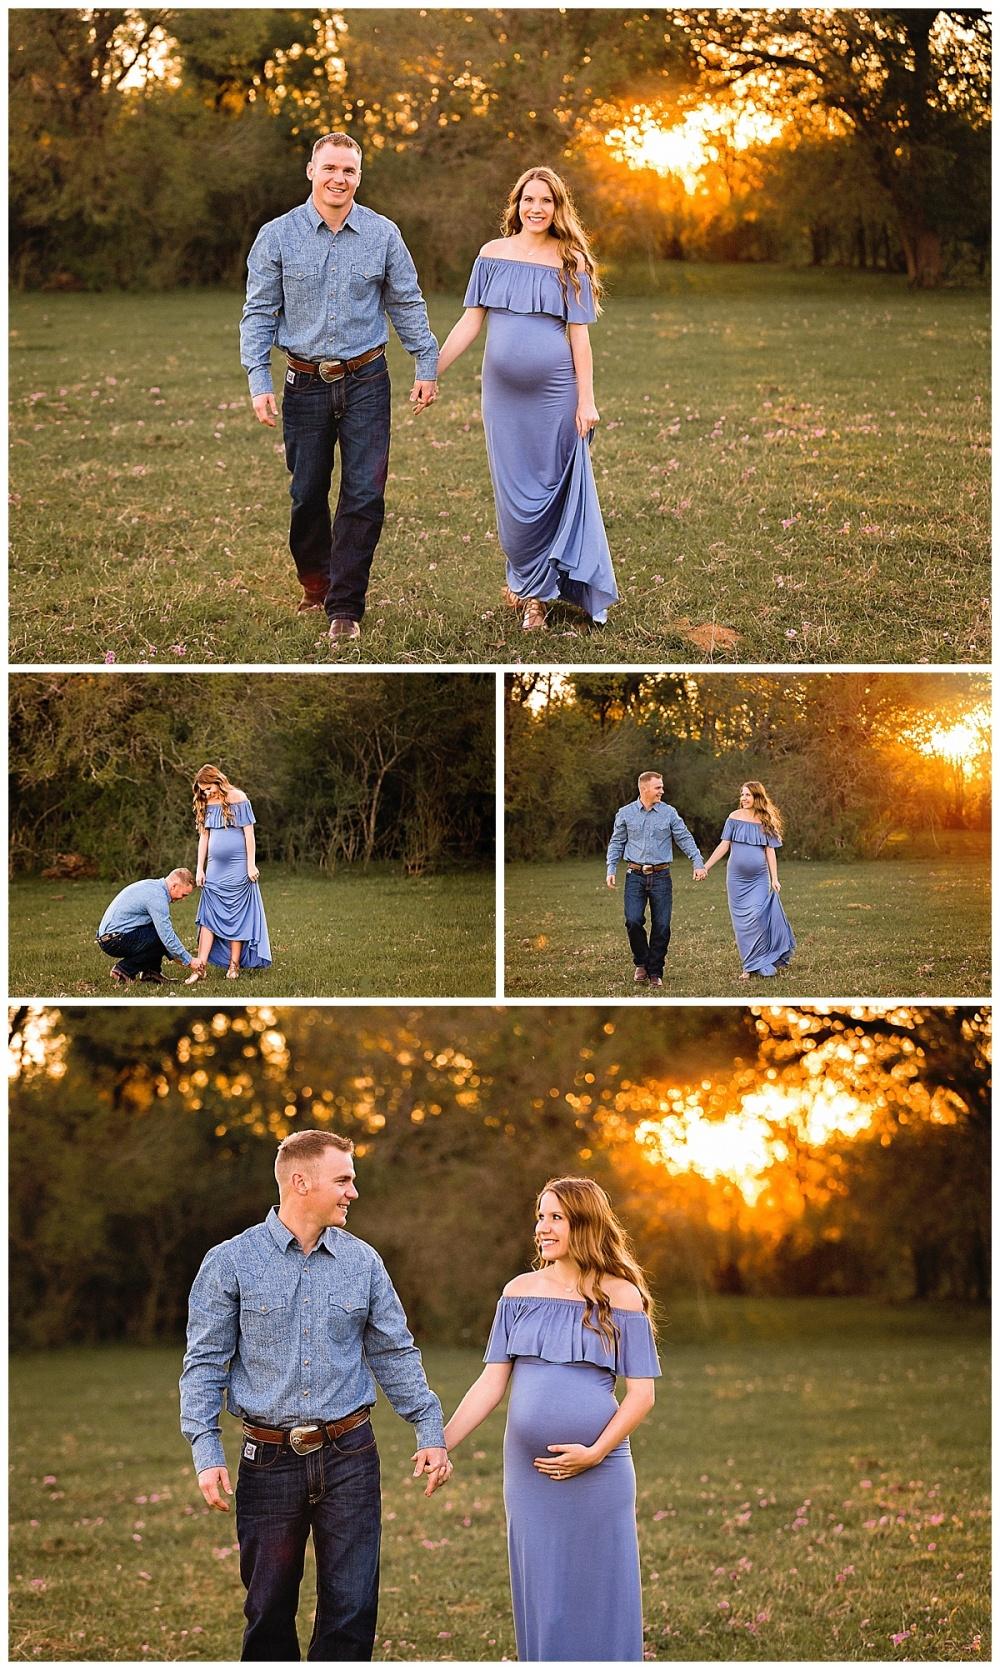 Carly-Barton-Photography-Geronimo-Oaks-Wedding-Venue-Texas-Hill-Country-Ronnie-Sarah_0138.jpg